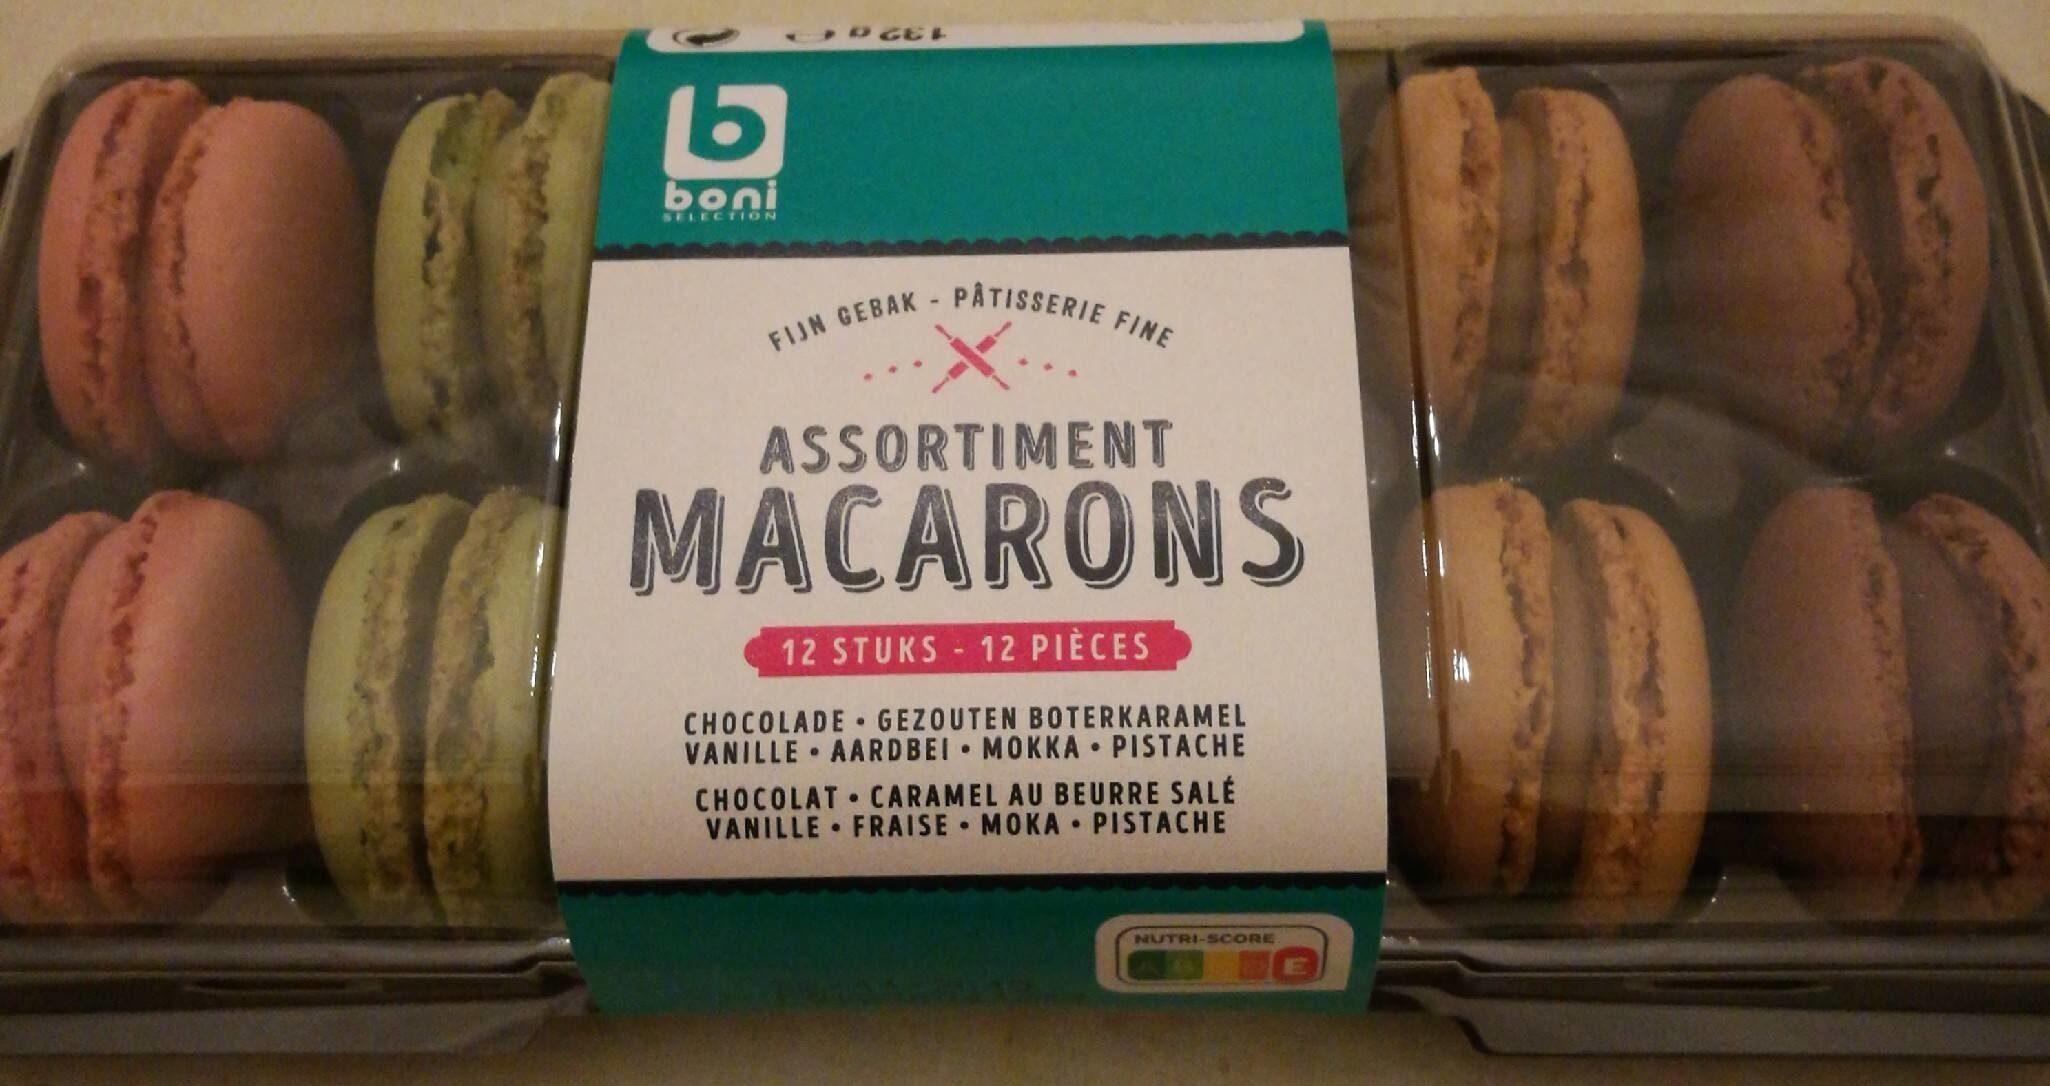 Assortiment de macarons - Product - fr